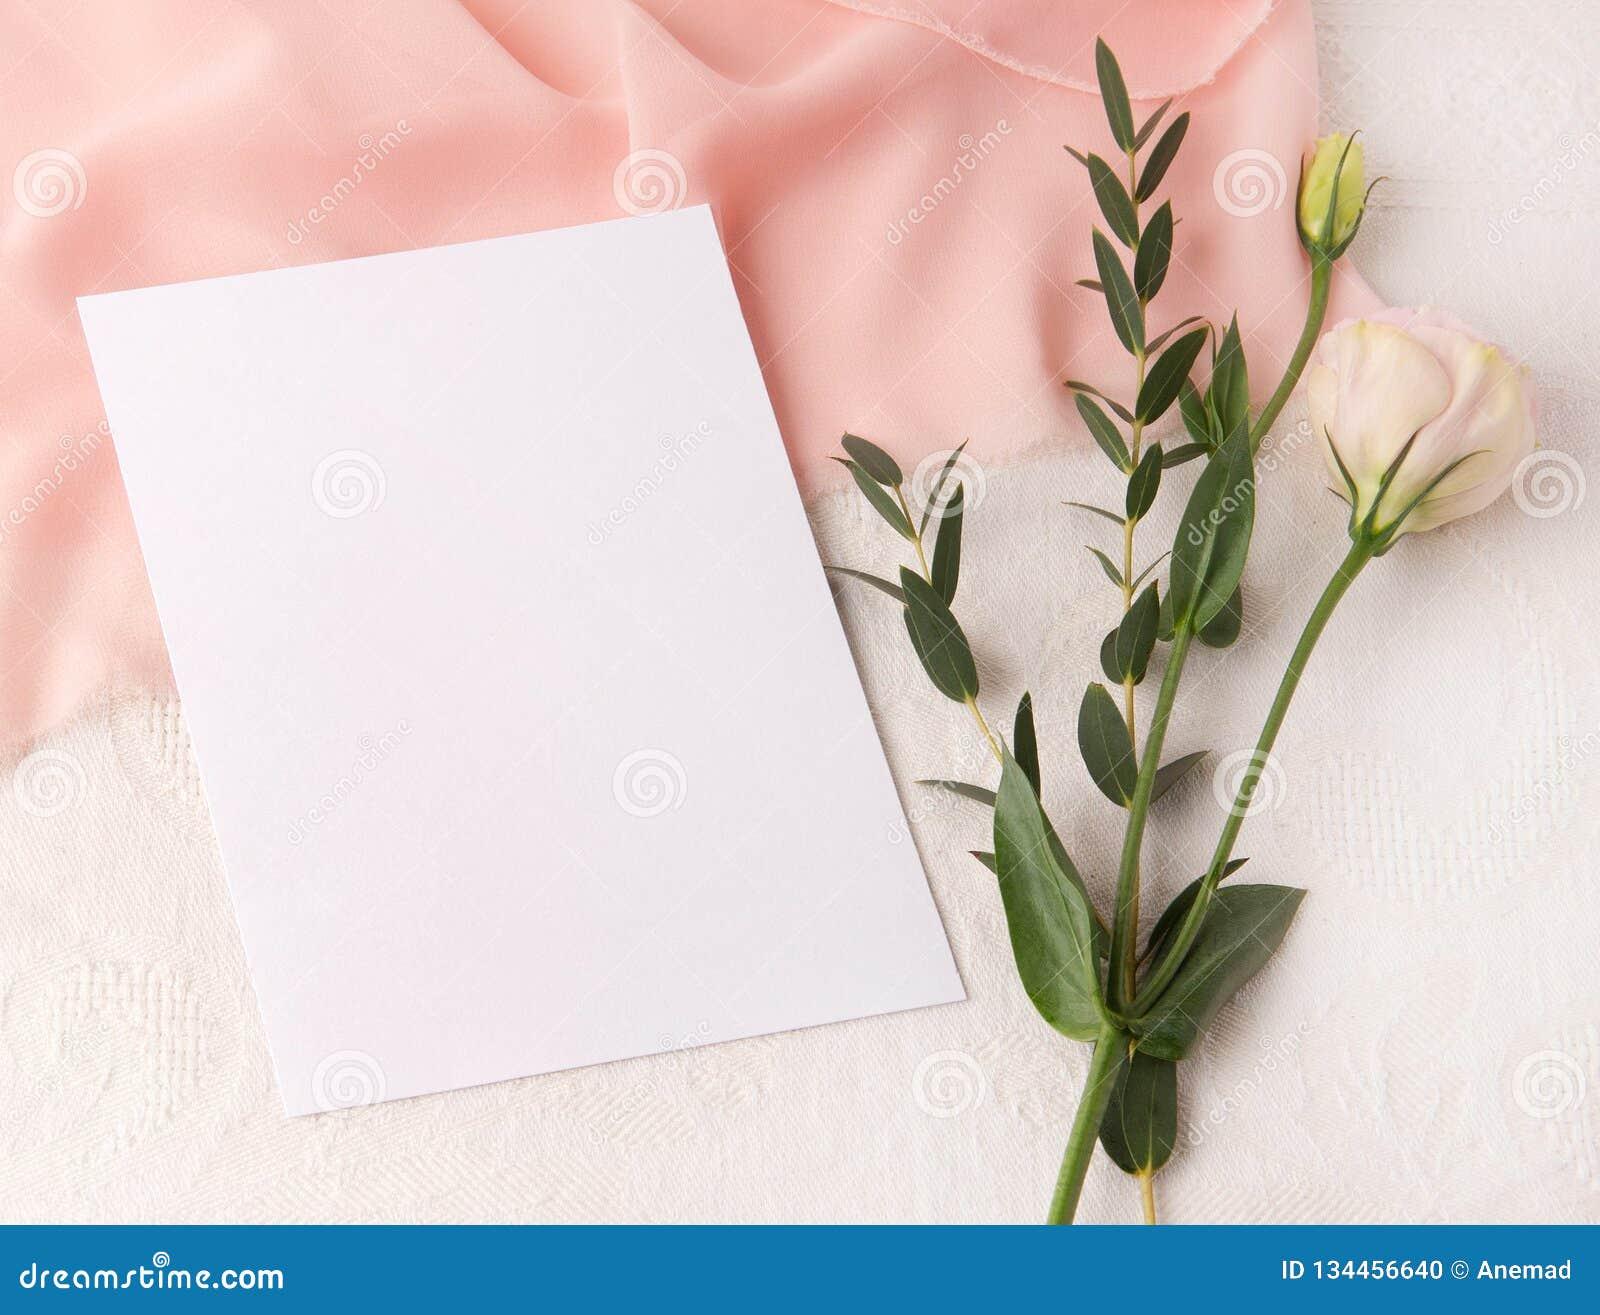 Wedding Invitation Mockup With Blush Silk And Flowers Stock Photo